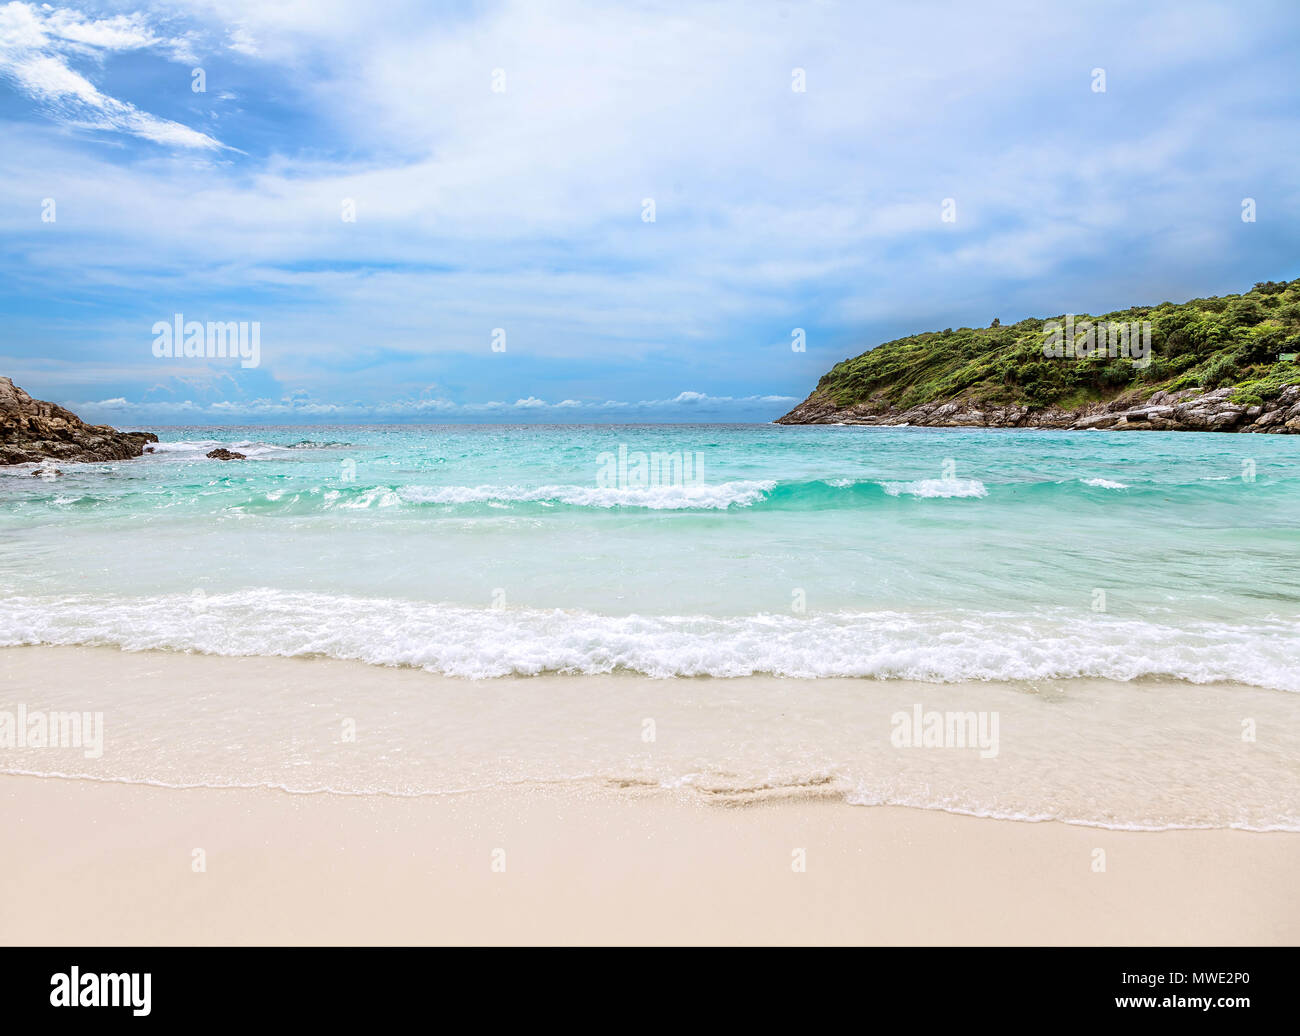 Tropical beach. Koh Racha. Thailand. - Stock Image